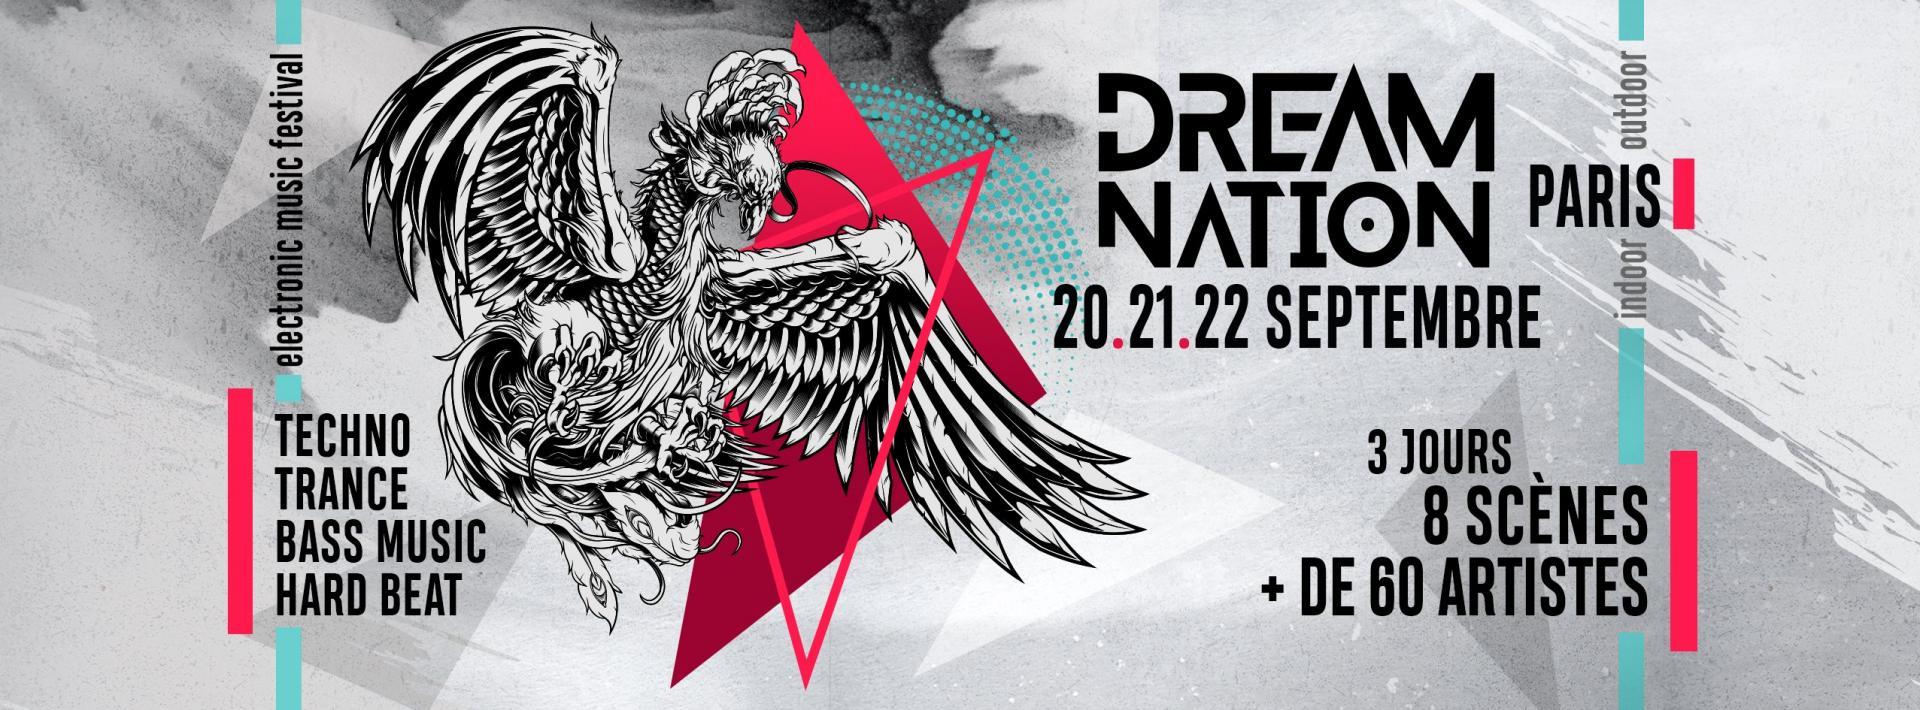 Dream nation festival 2019 ban